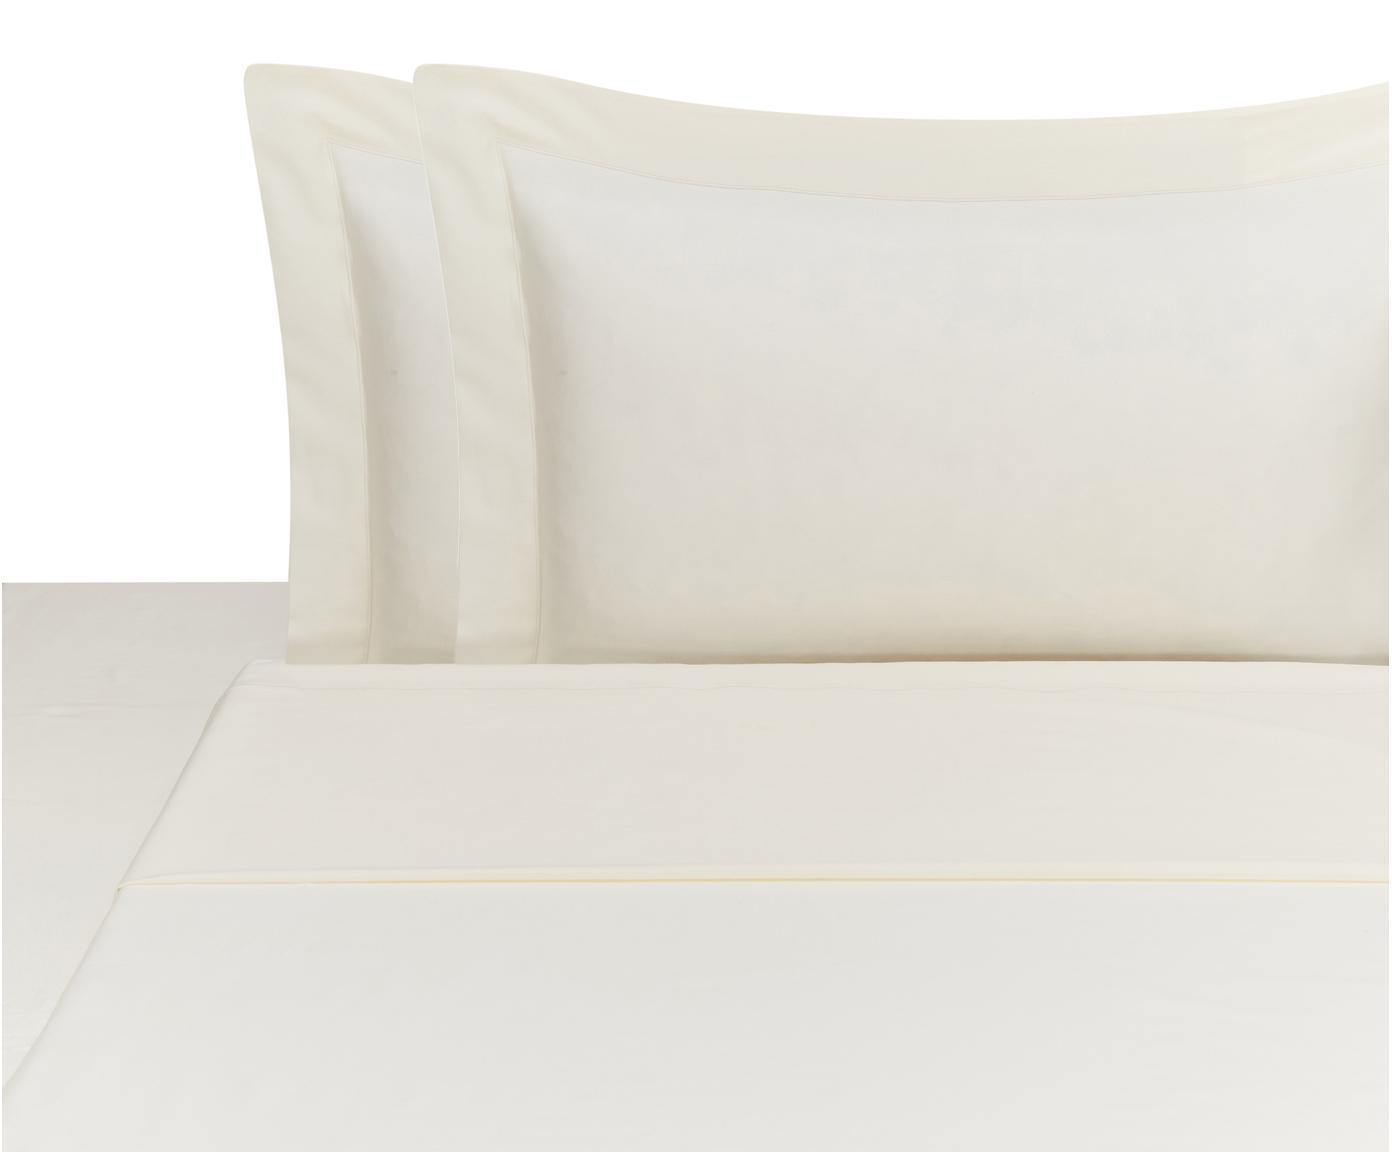 Set lenzuola in raso di cotone Cleo, 4 pz, Beige chiaro, 260 x 295 cm